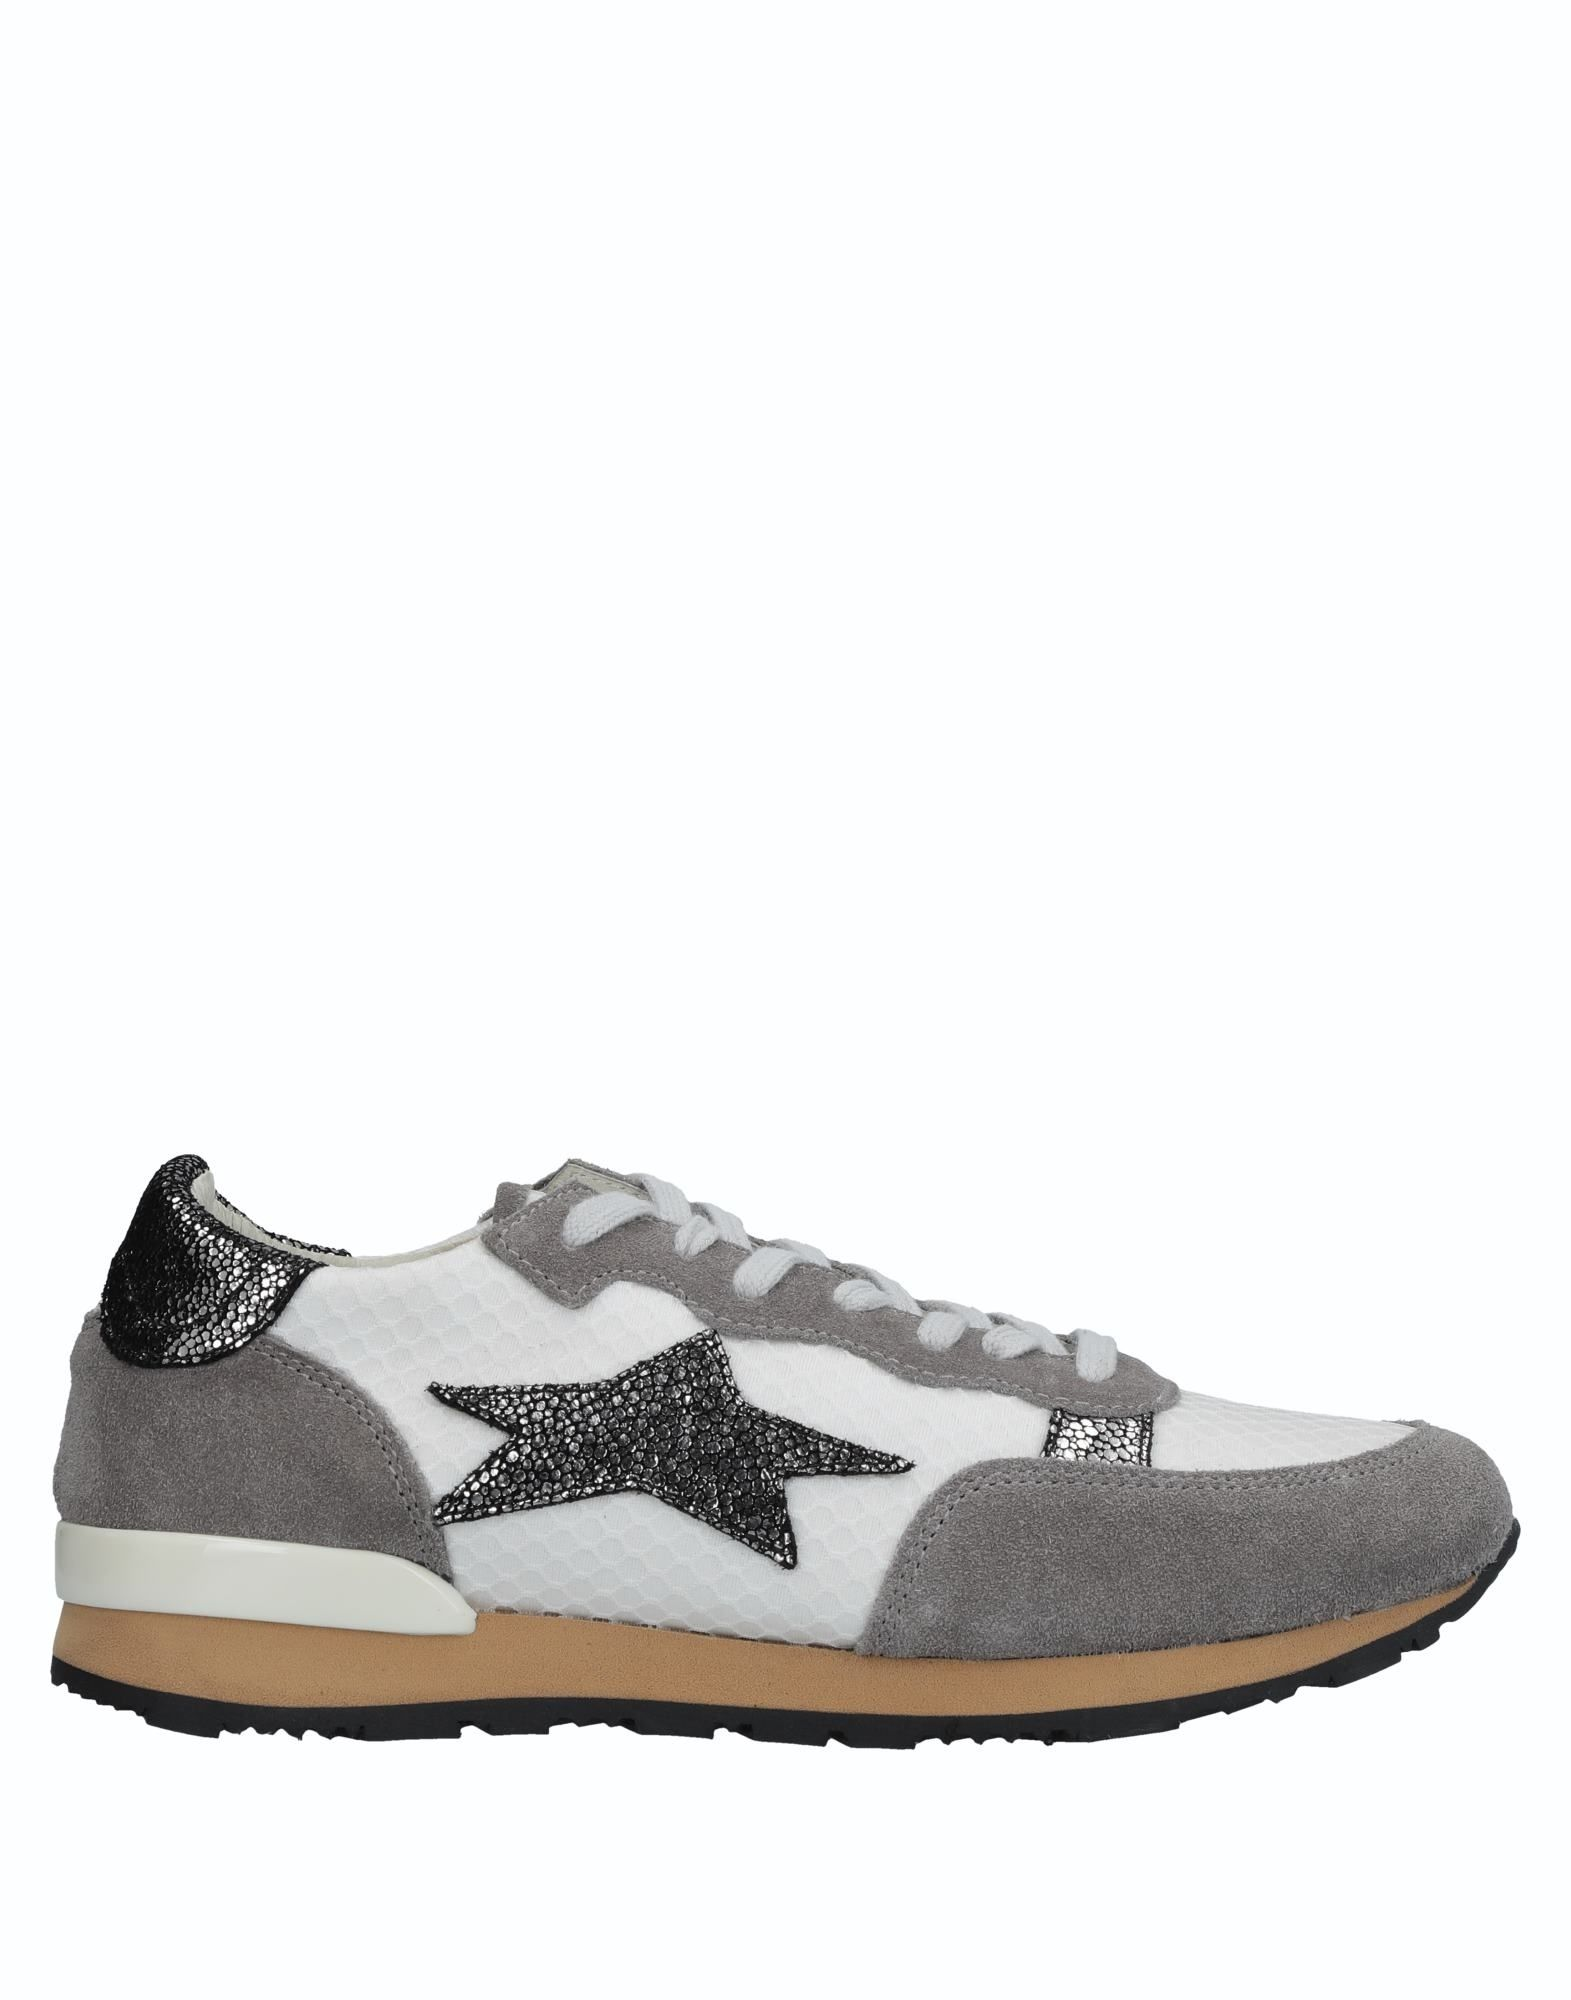 Ishikawa Sneakers Damen  11523614UI Gute Qualität beliebte Schuhe